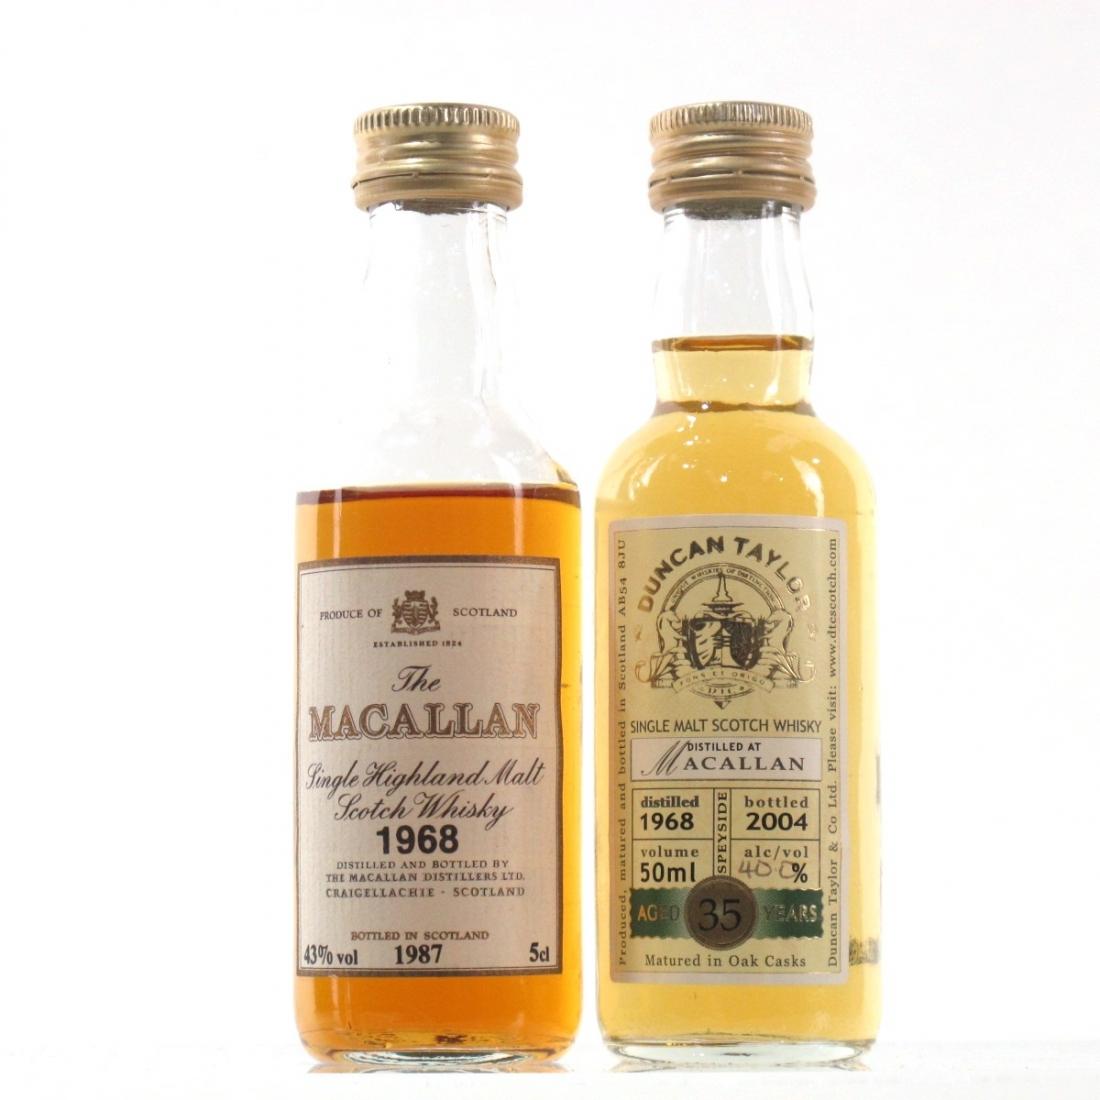 Macallan 1968 Miniatures 2 x 5cl